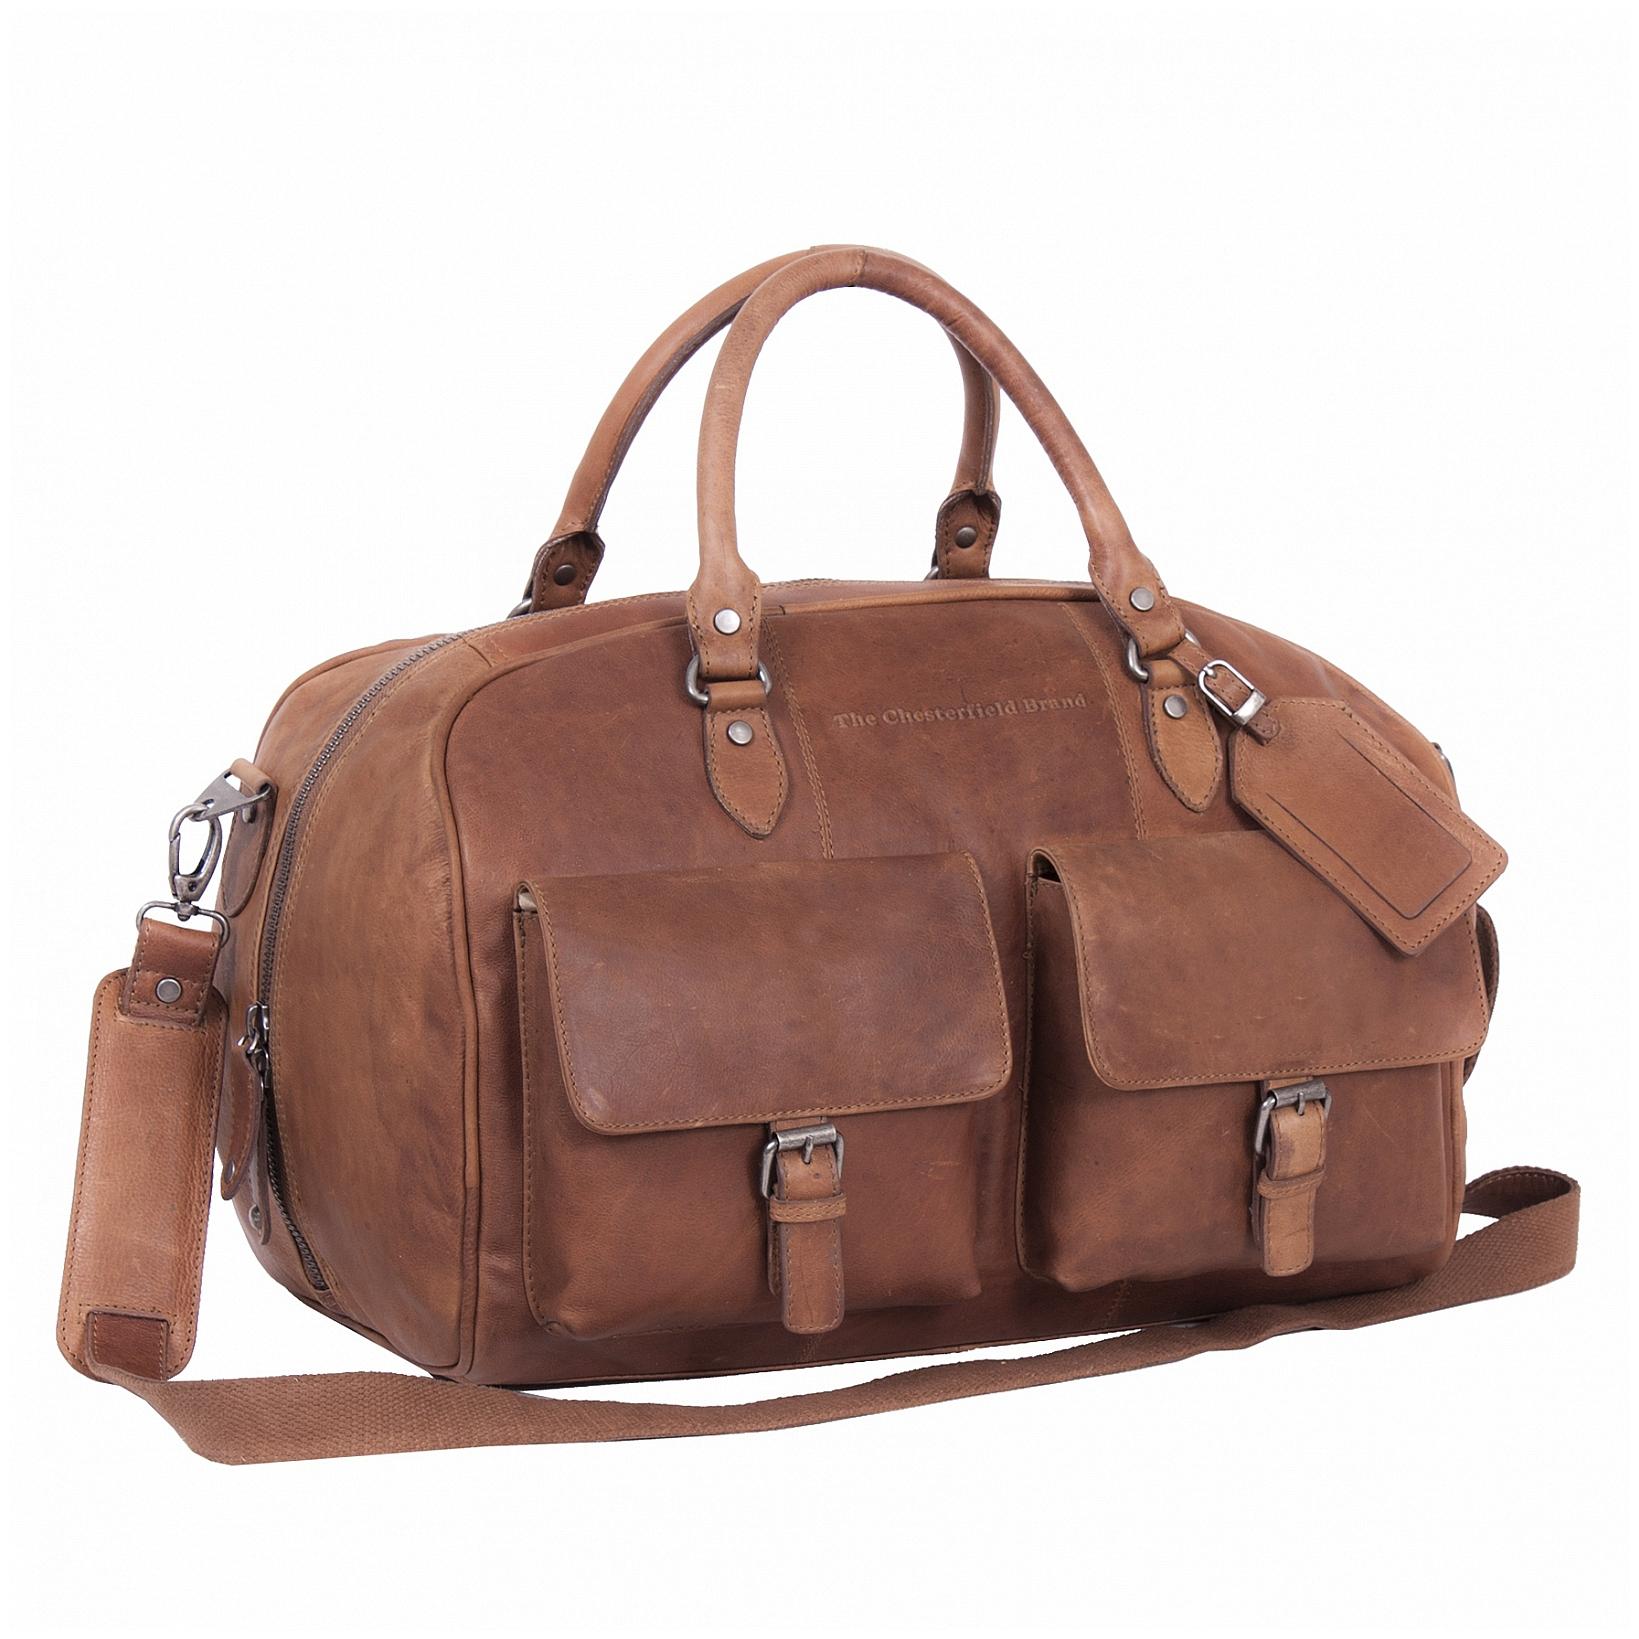 The Chesterfield Brand Kožená cestovní taška - weekender C20.001531 Wyatt koňak